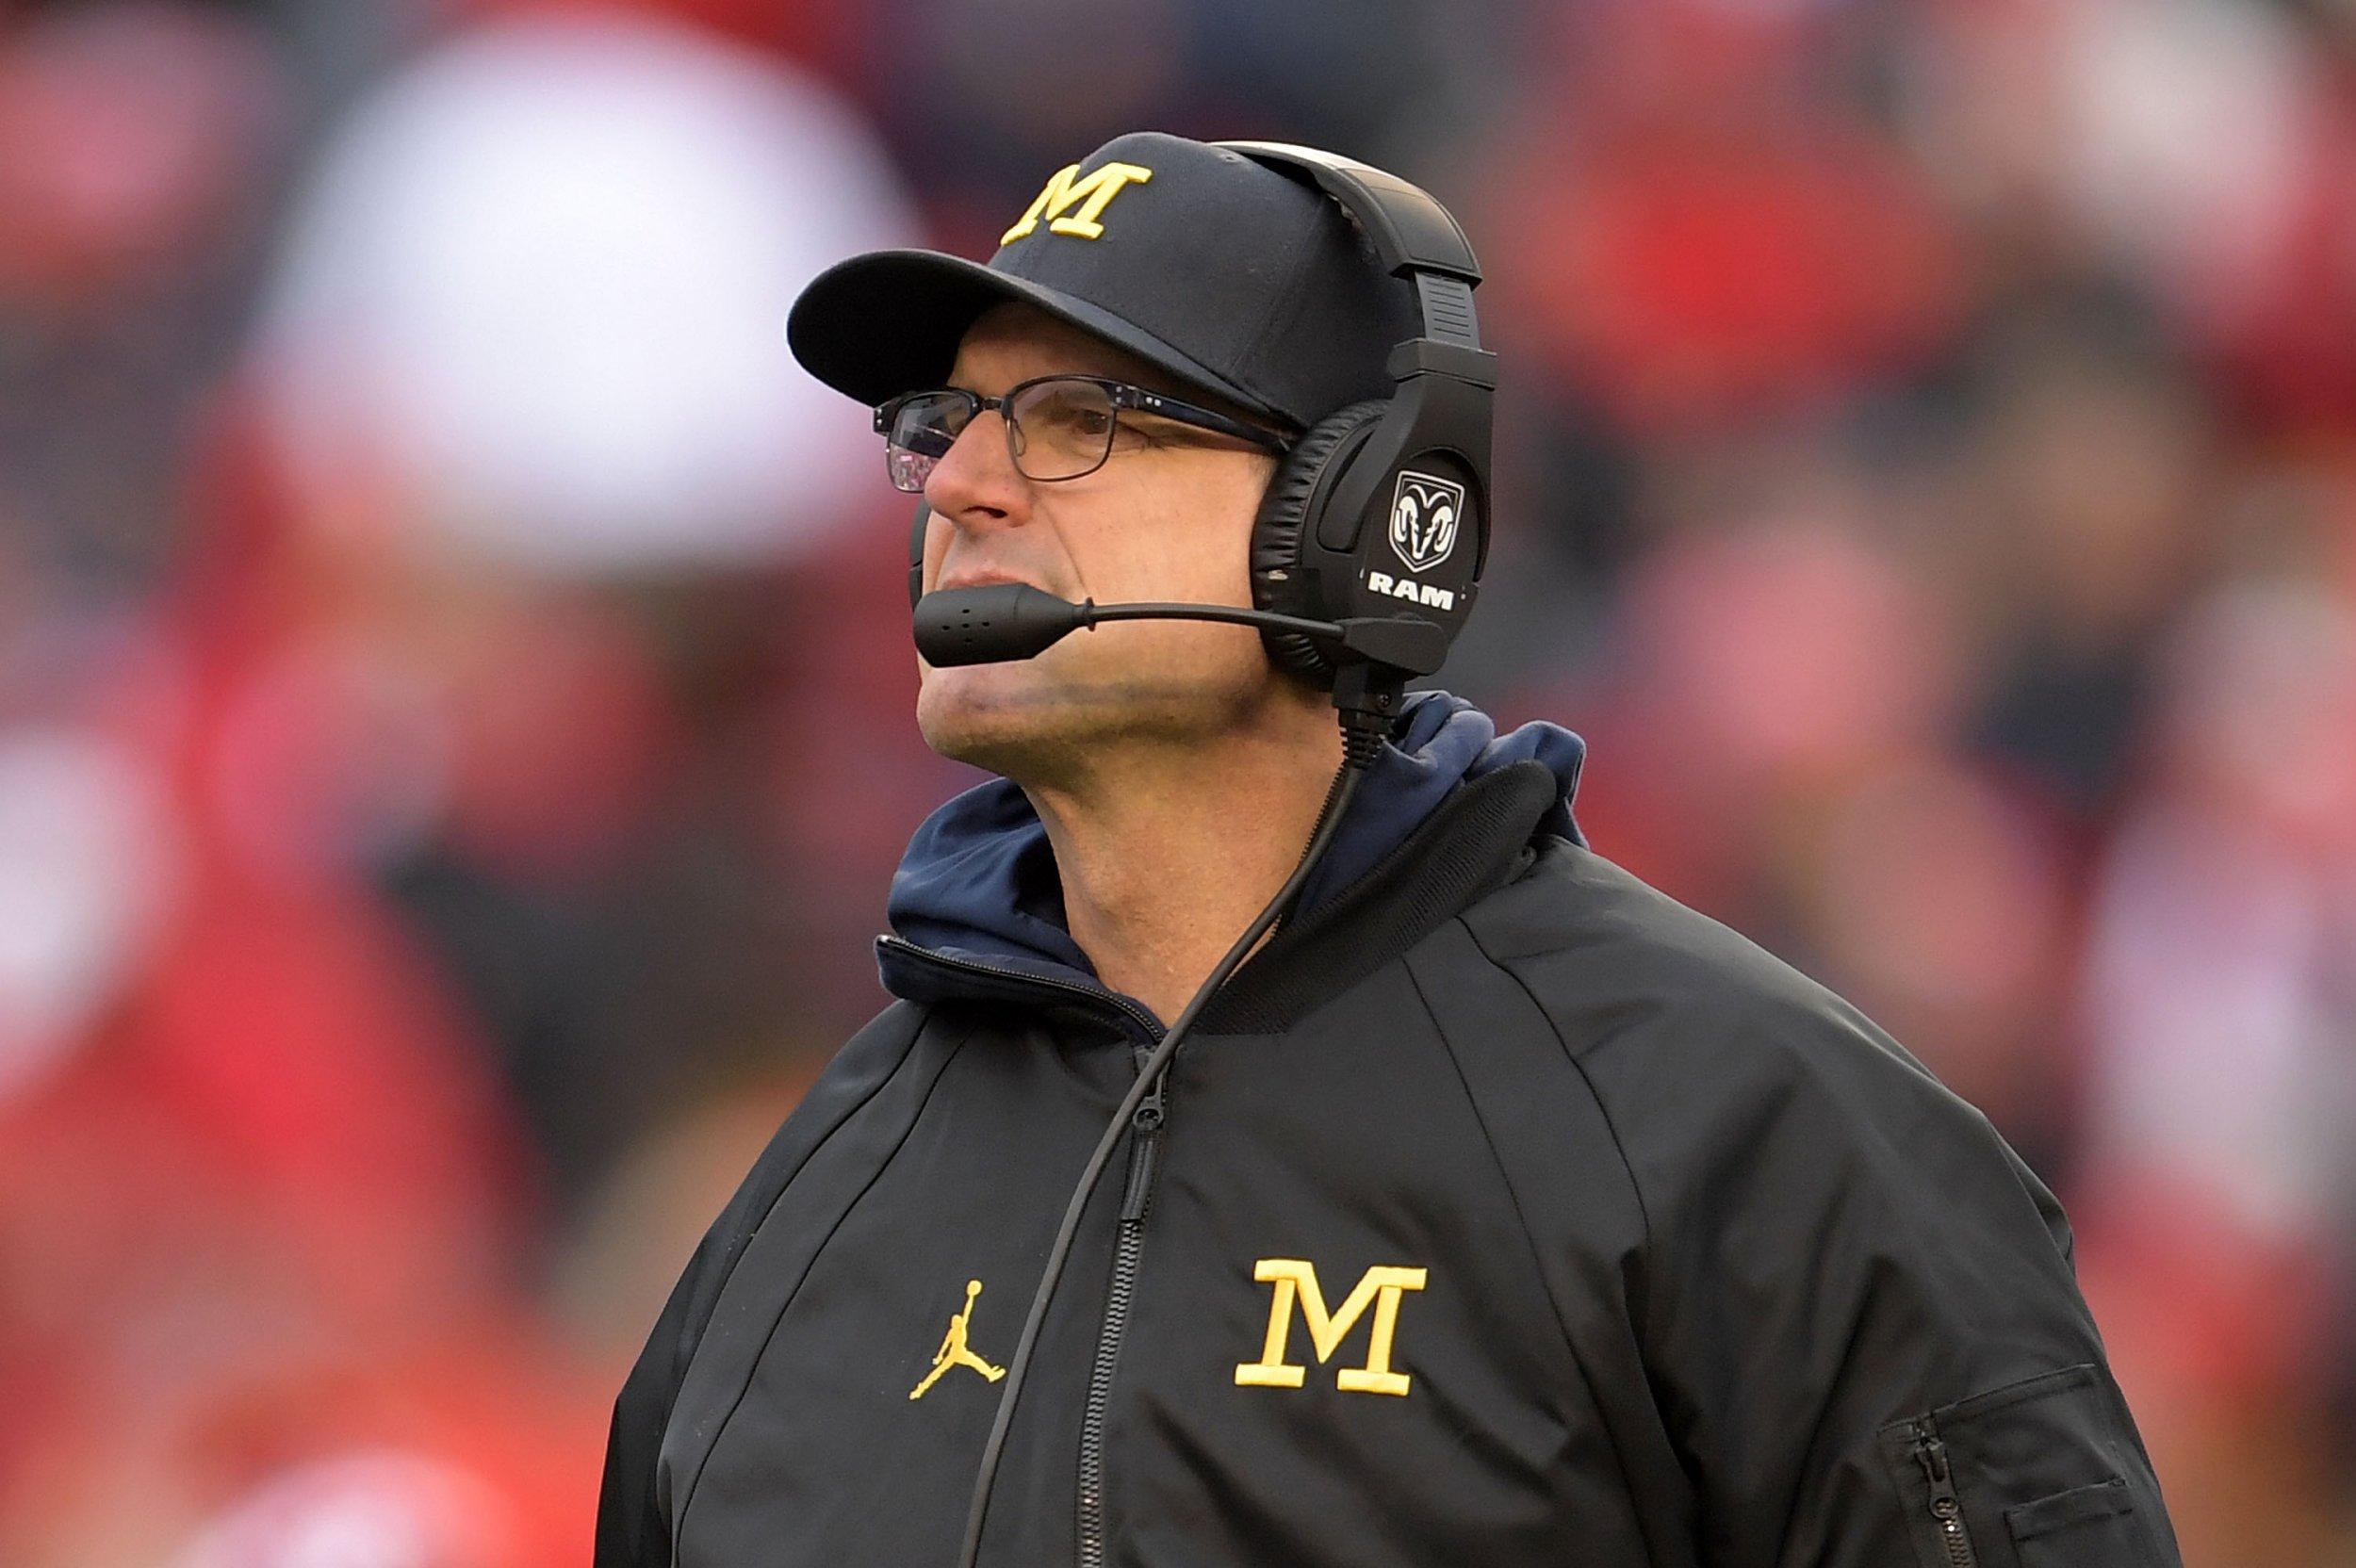 University of Michigan head football coach Jim Harbaugh.